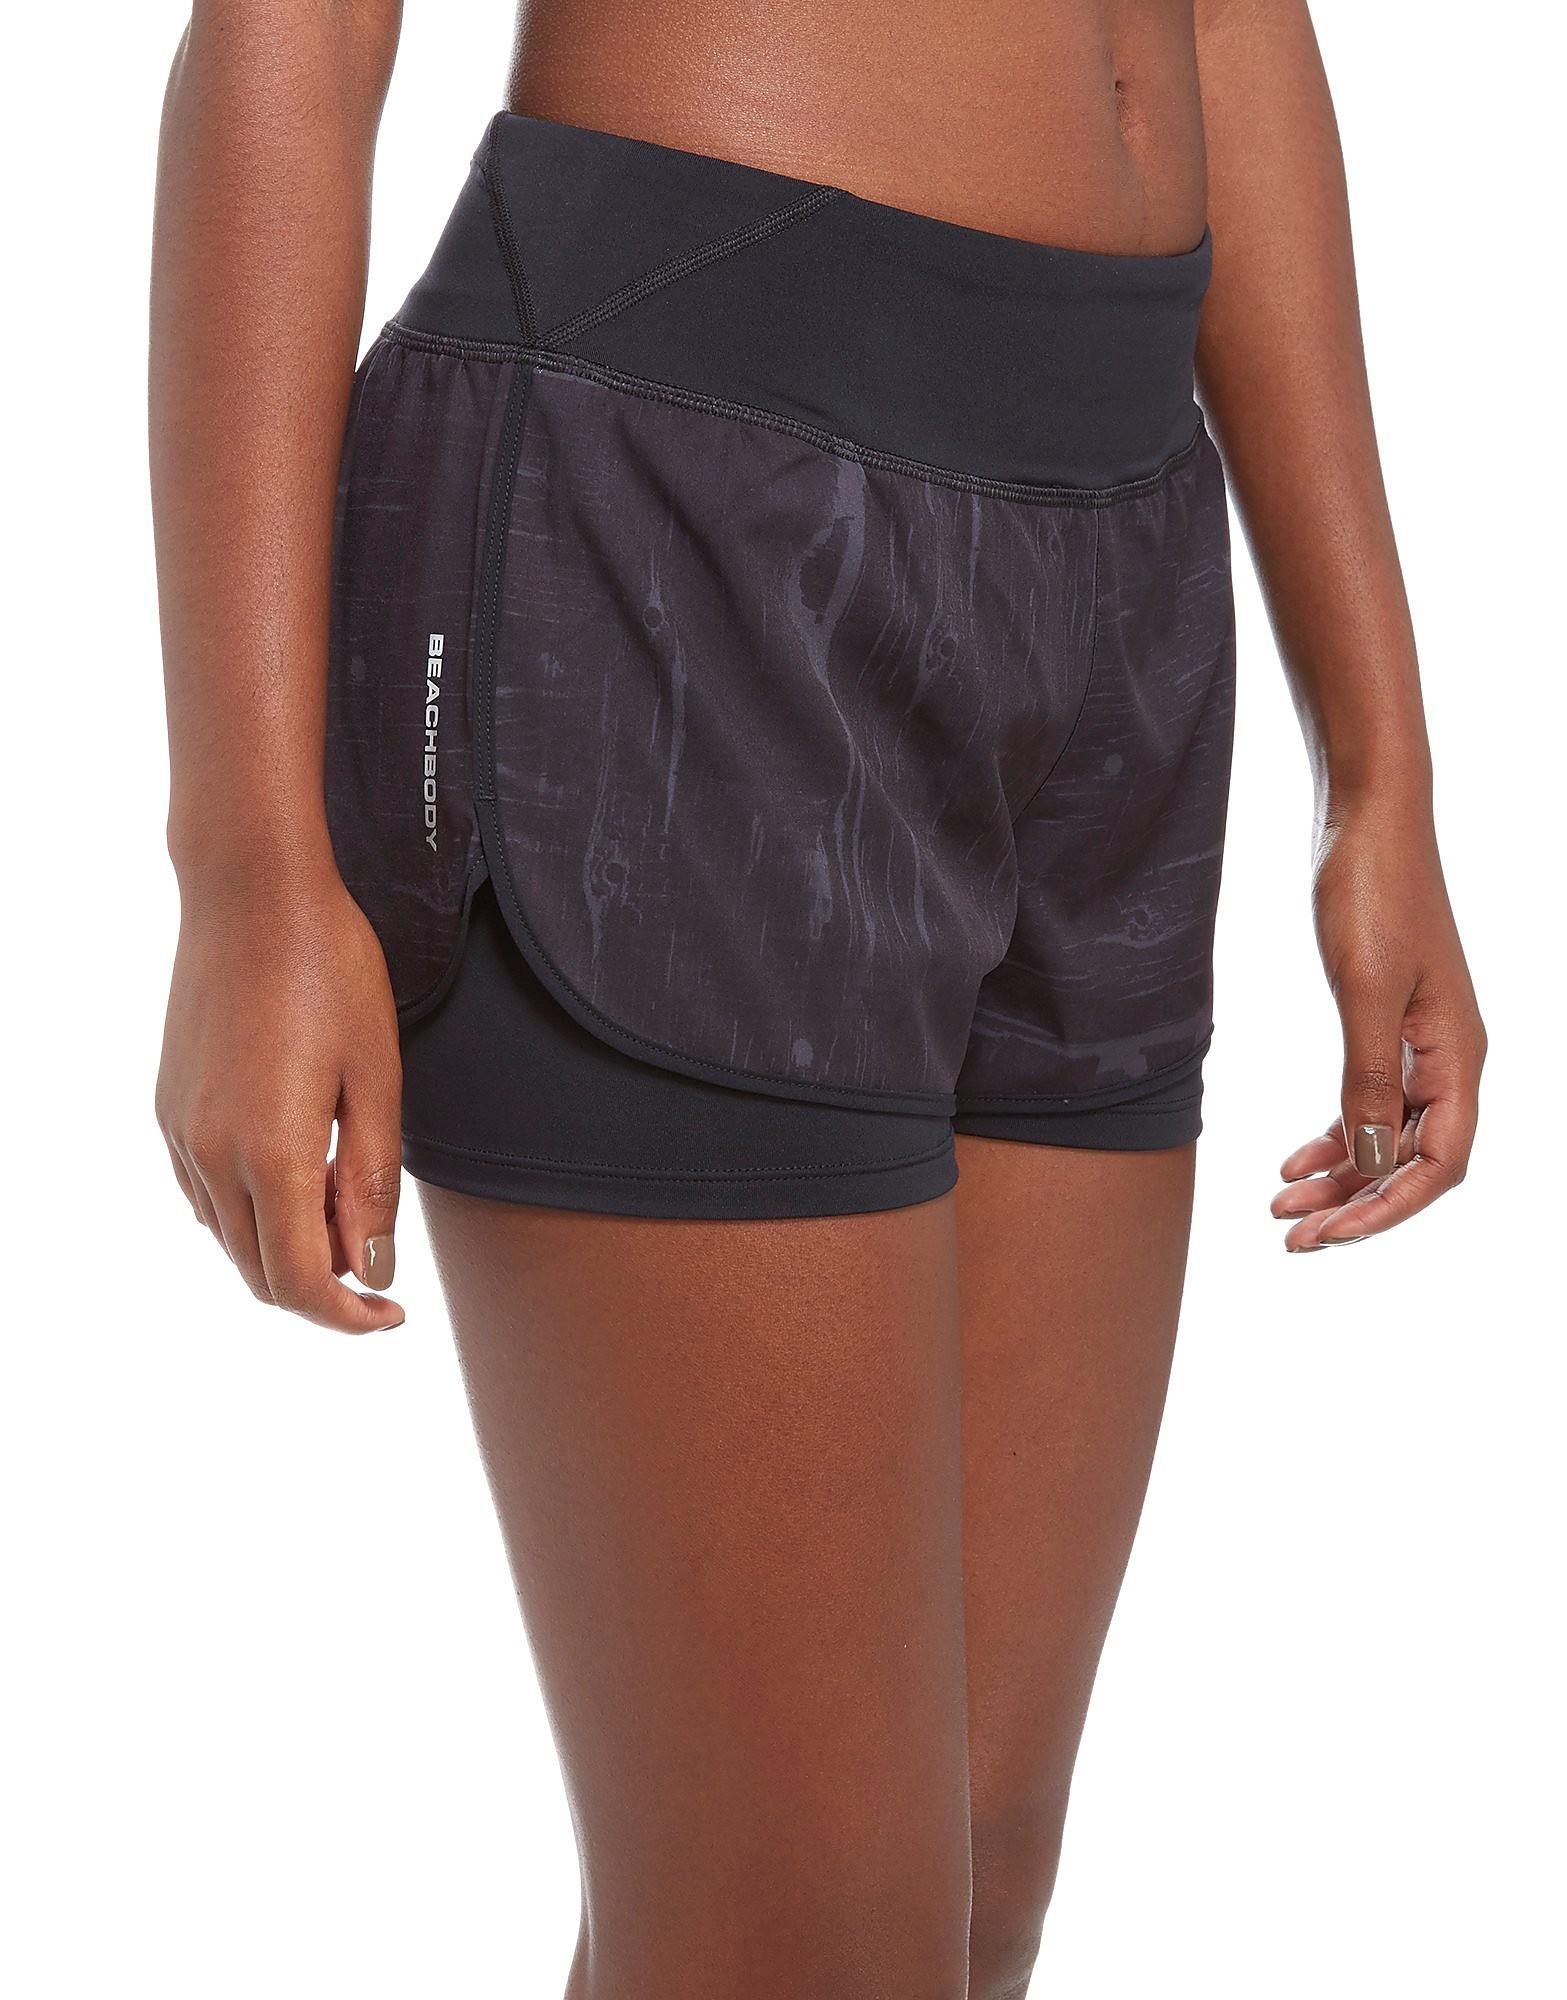 Beachbody Flex 2-in-1 Shorts